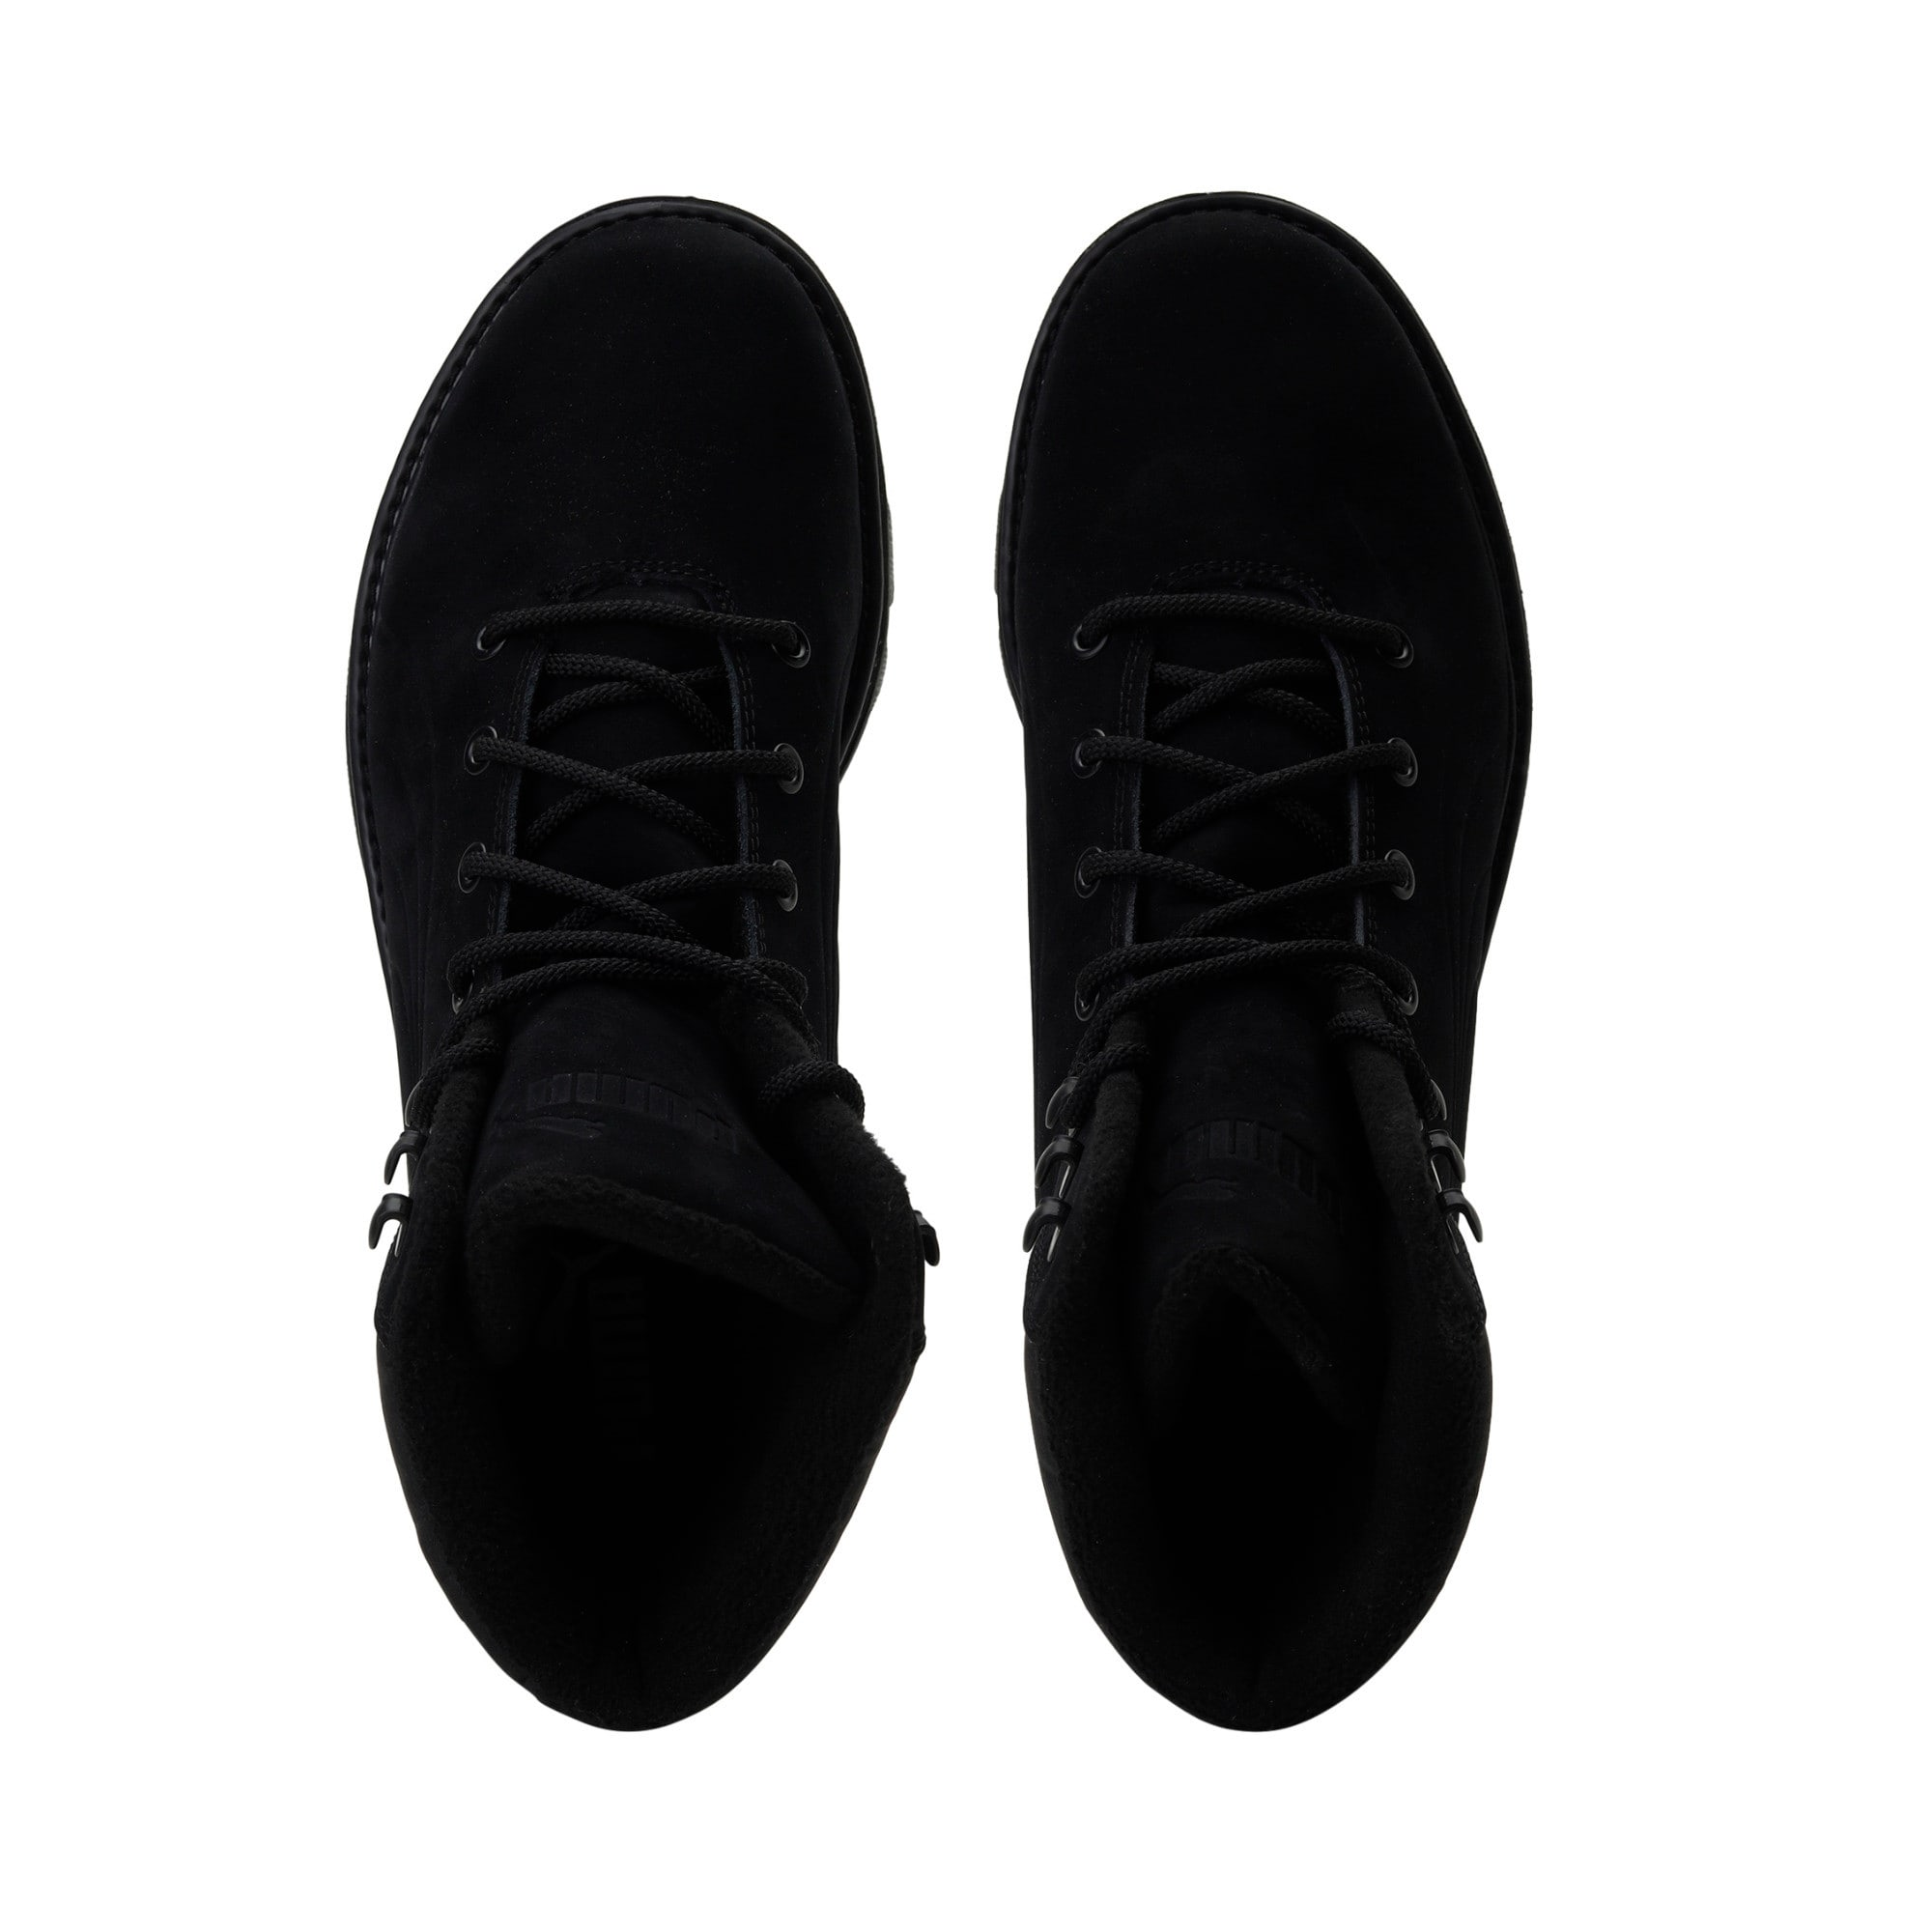 Thumbnail 6 of Desierto Fun Winter Boots, Puma Black- Black- Black, medium-IND